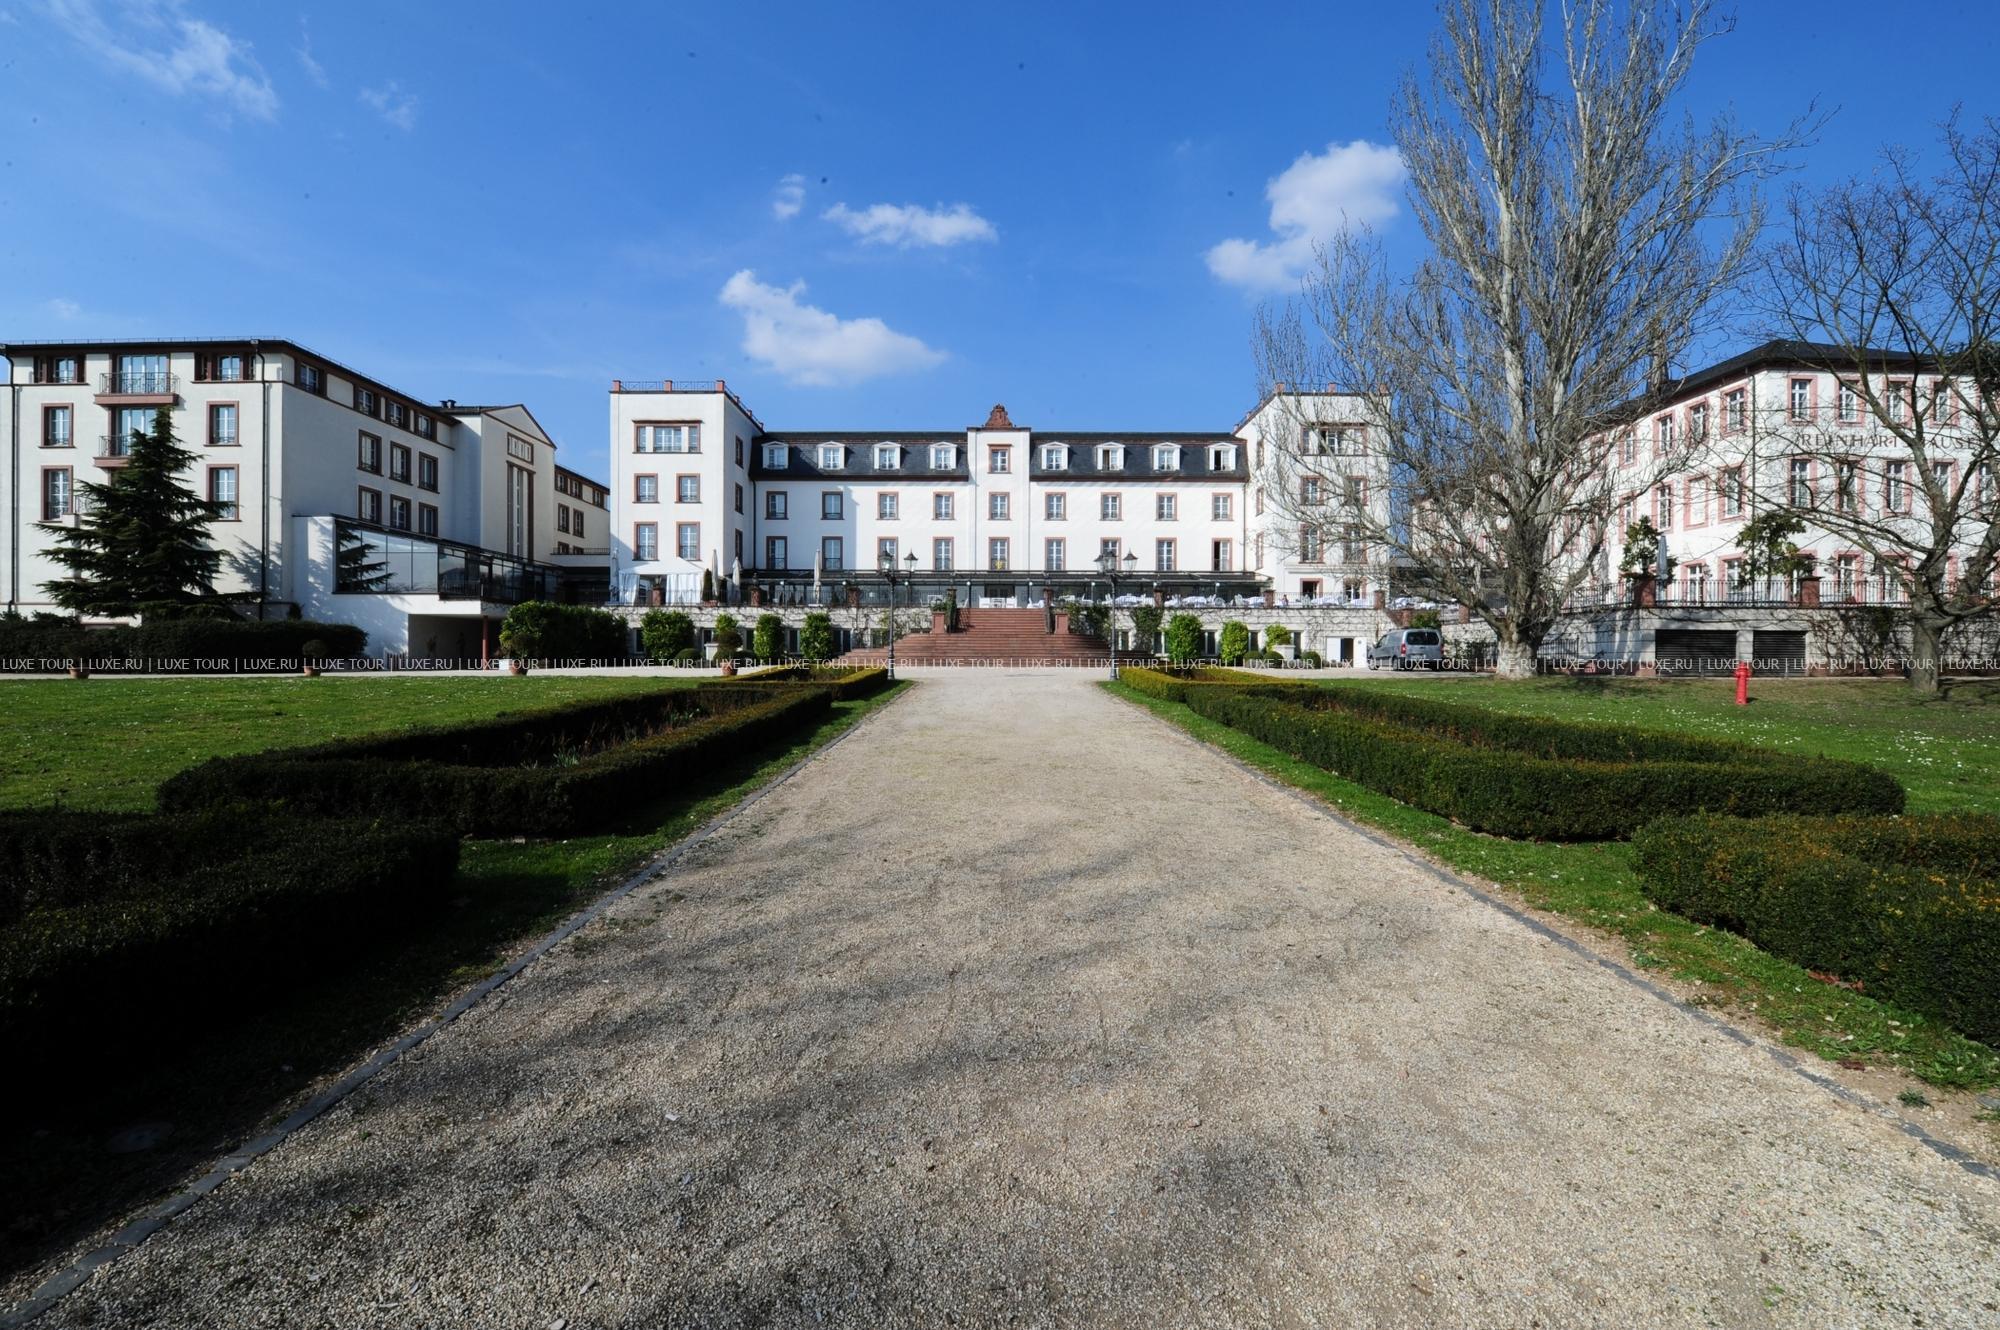 Schloss Reinhartshausen Kempinski, Эльтвилле-на-Рейне